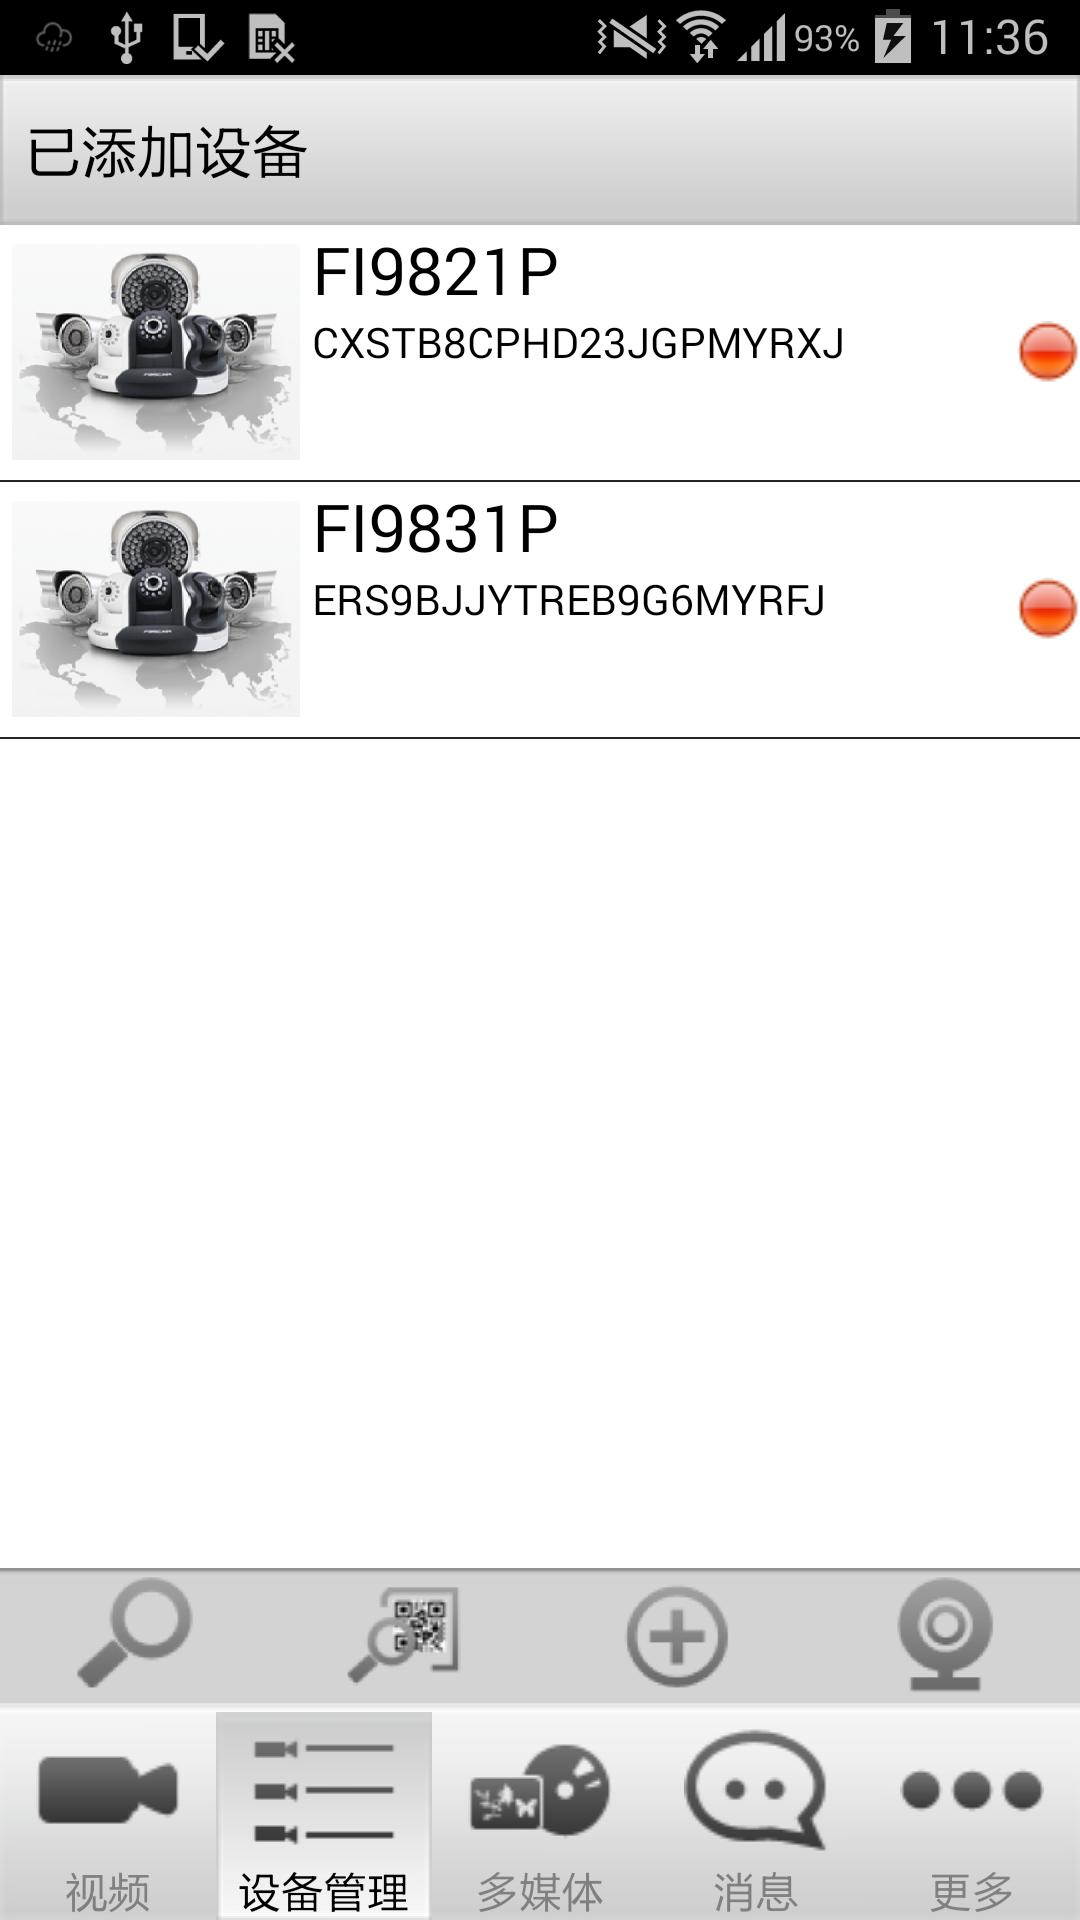 Foscam Viewer下载安卓最新版_手机app官方版免费安装下载_豌豆荚